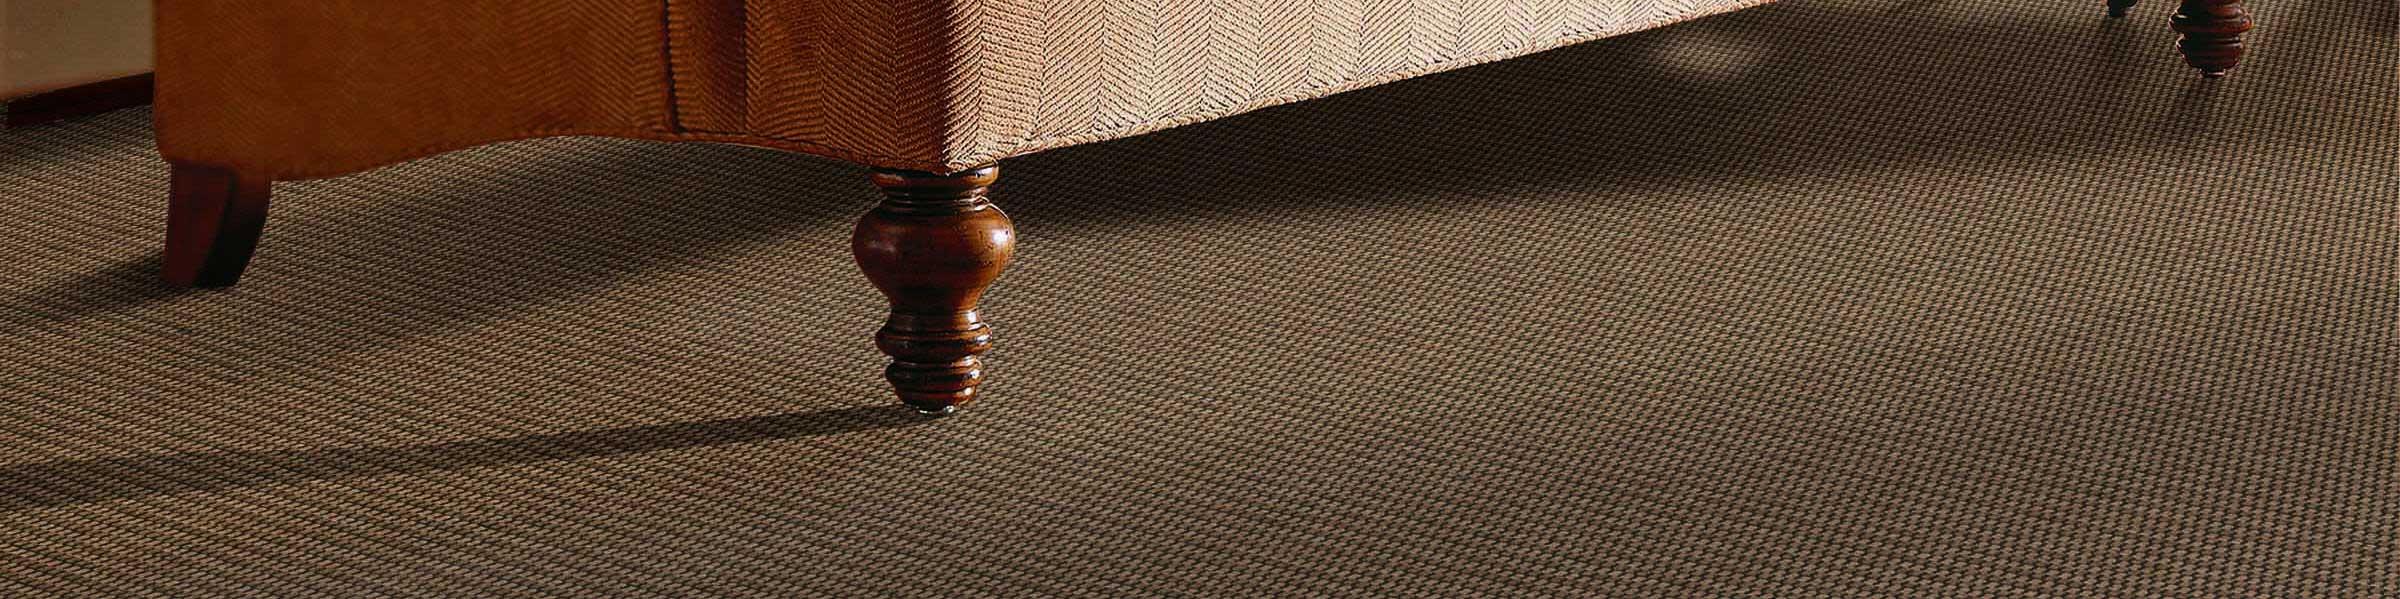 Carpet Amp Rugs Wool Carpeting Installation Plymouth Mn